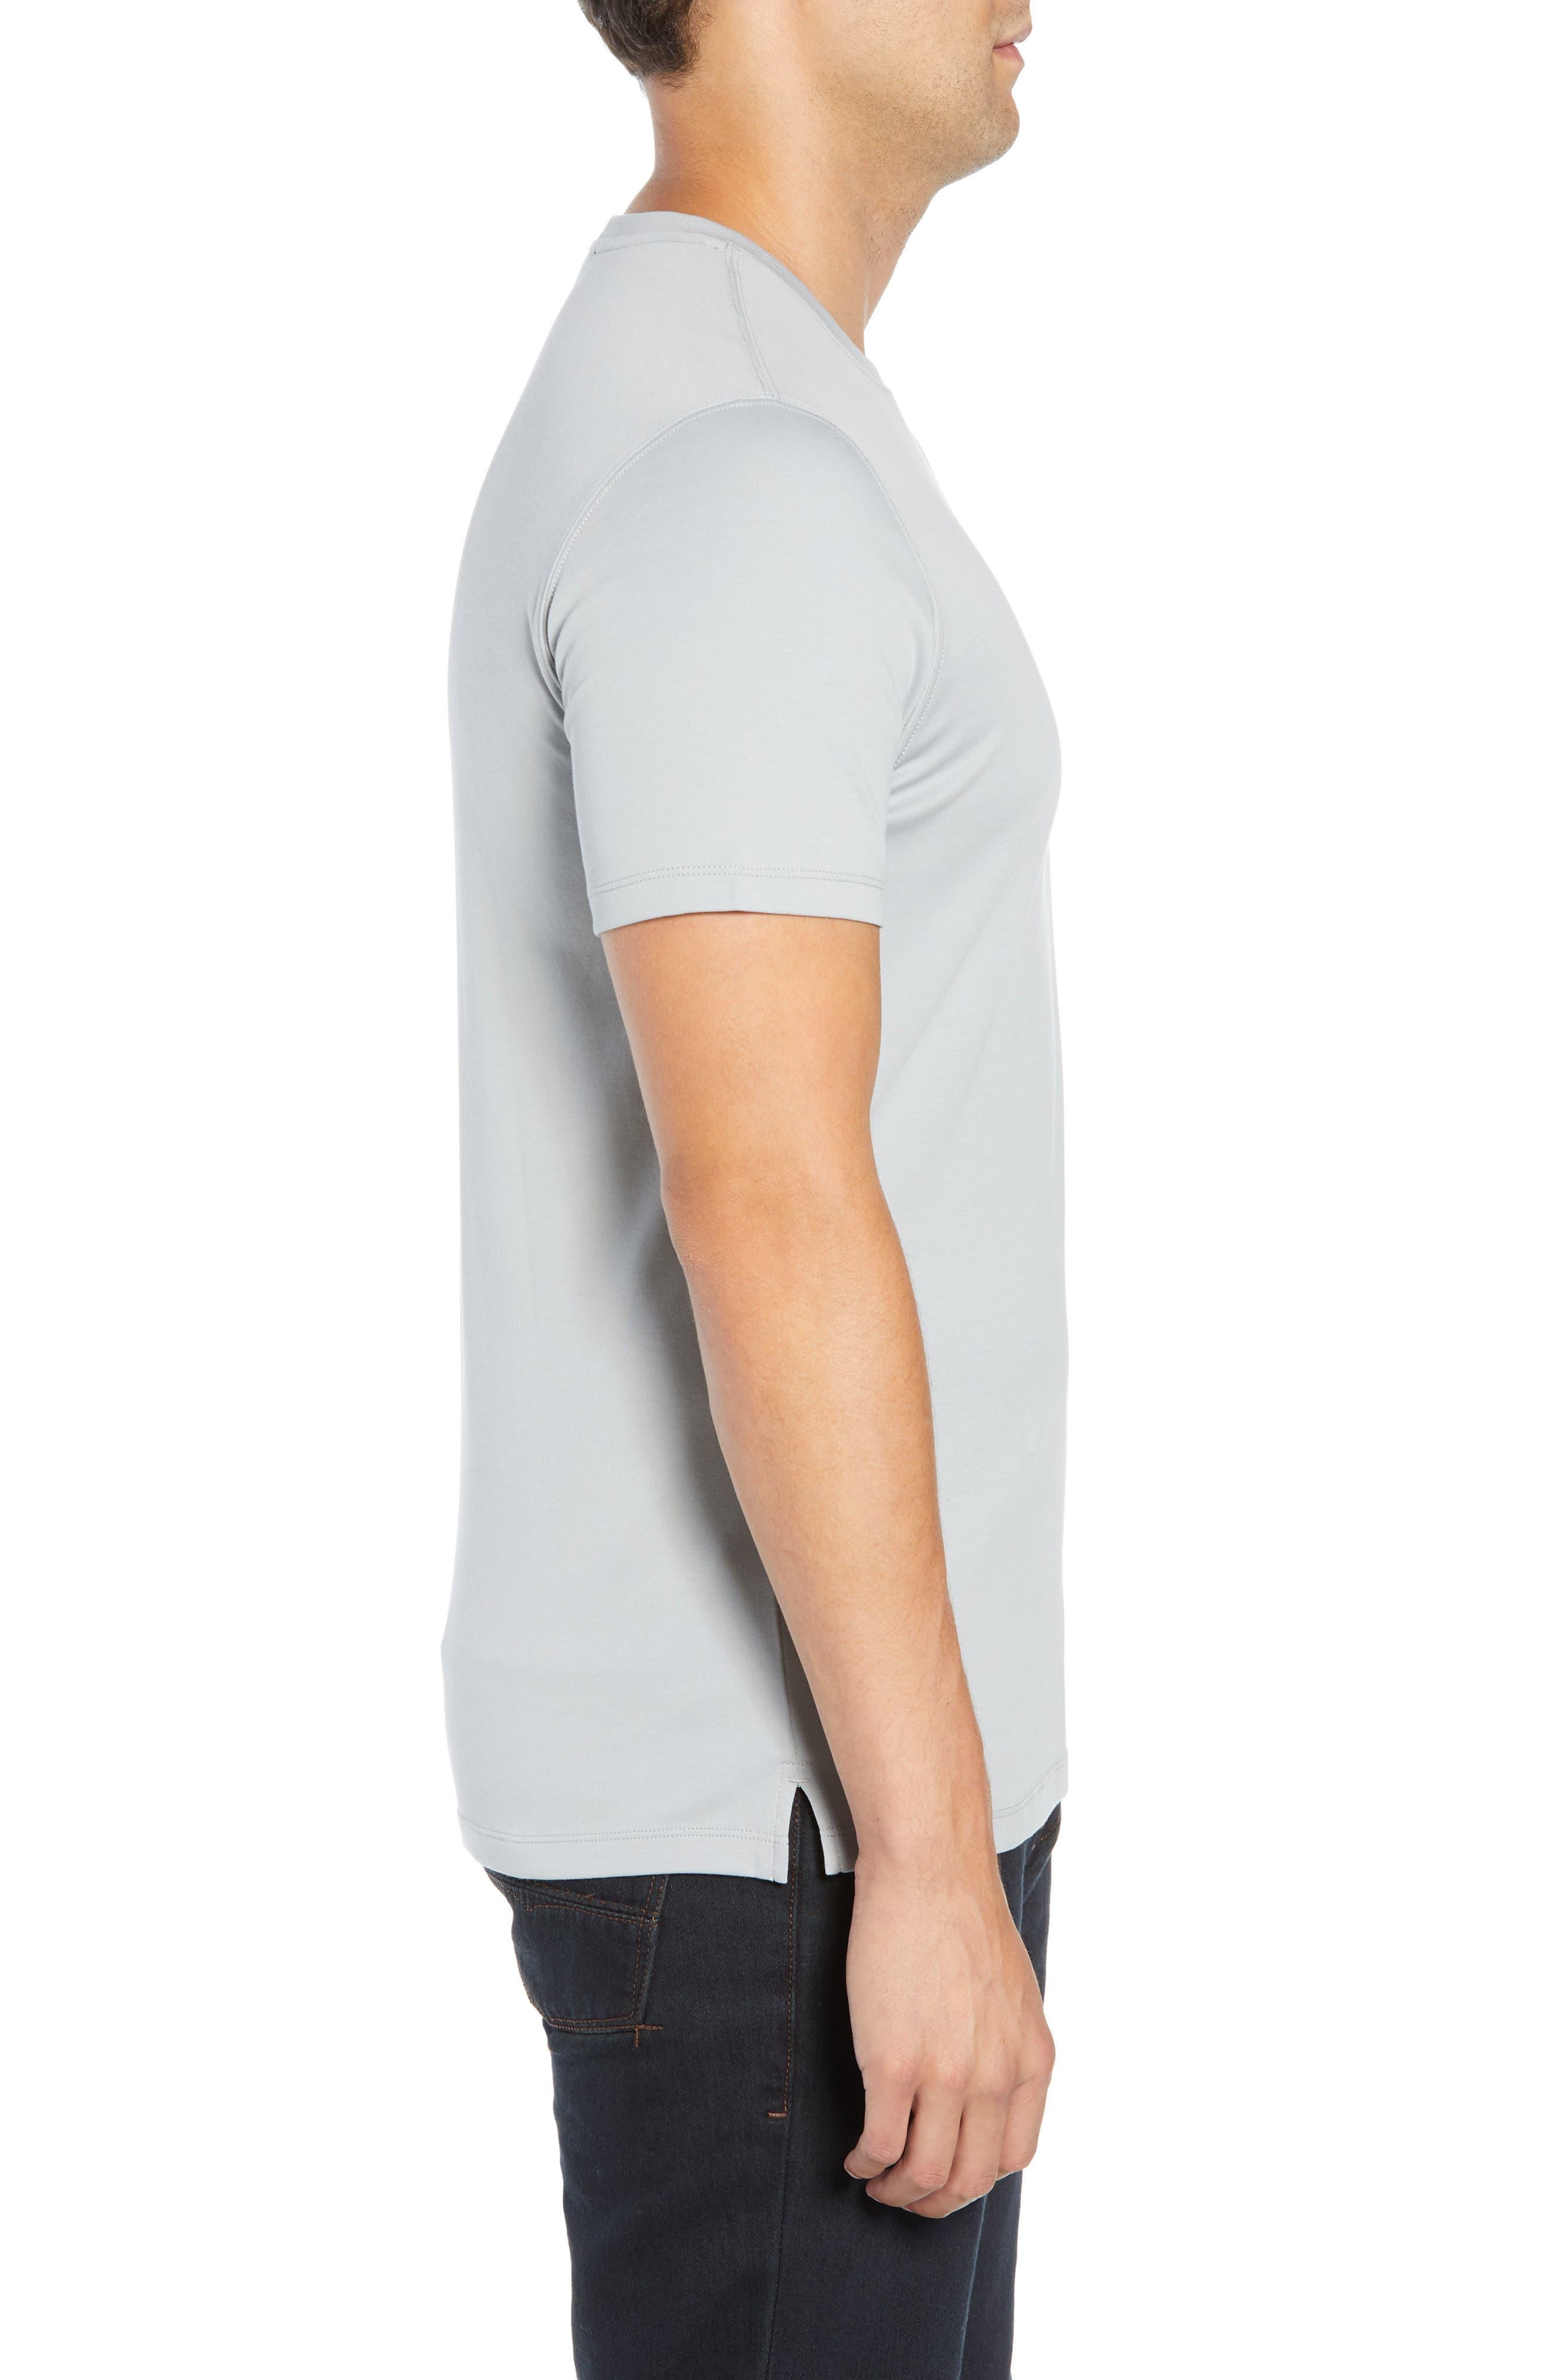 ROBERT BARAKETT,                             'Georgia' Crewneck T-Shirt,                             Alternate thumbnail 3, color,                             MOON DUST